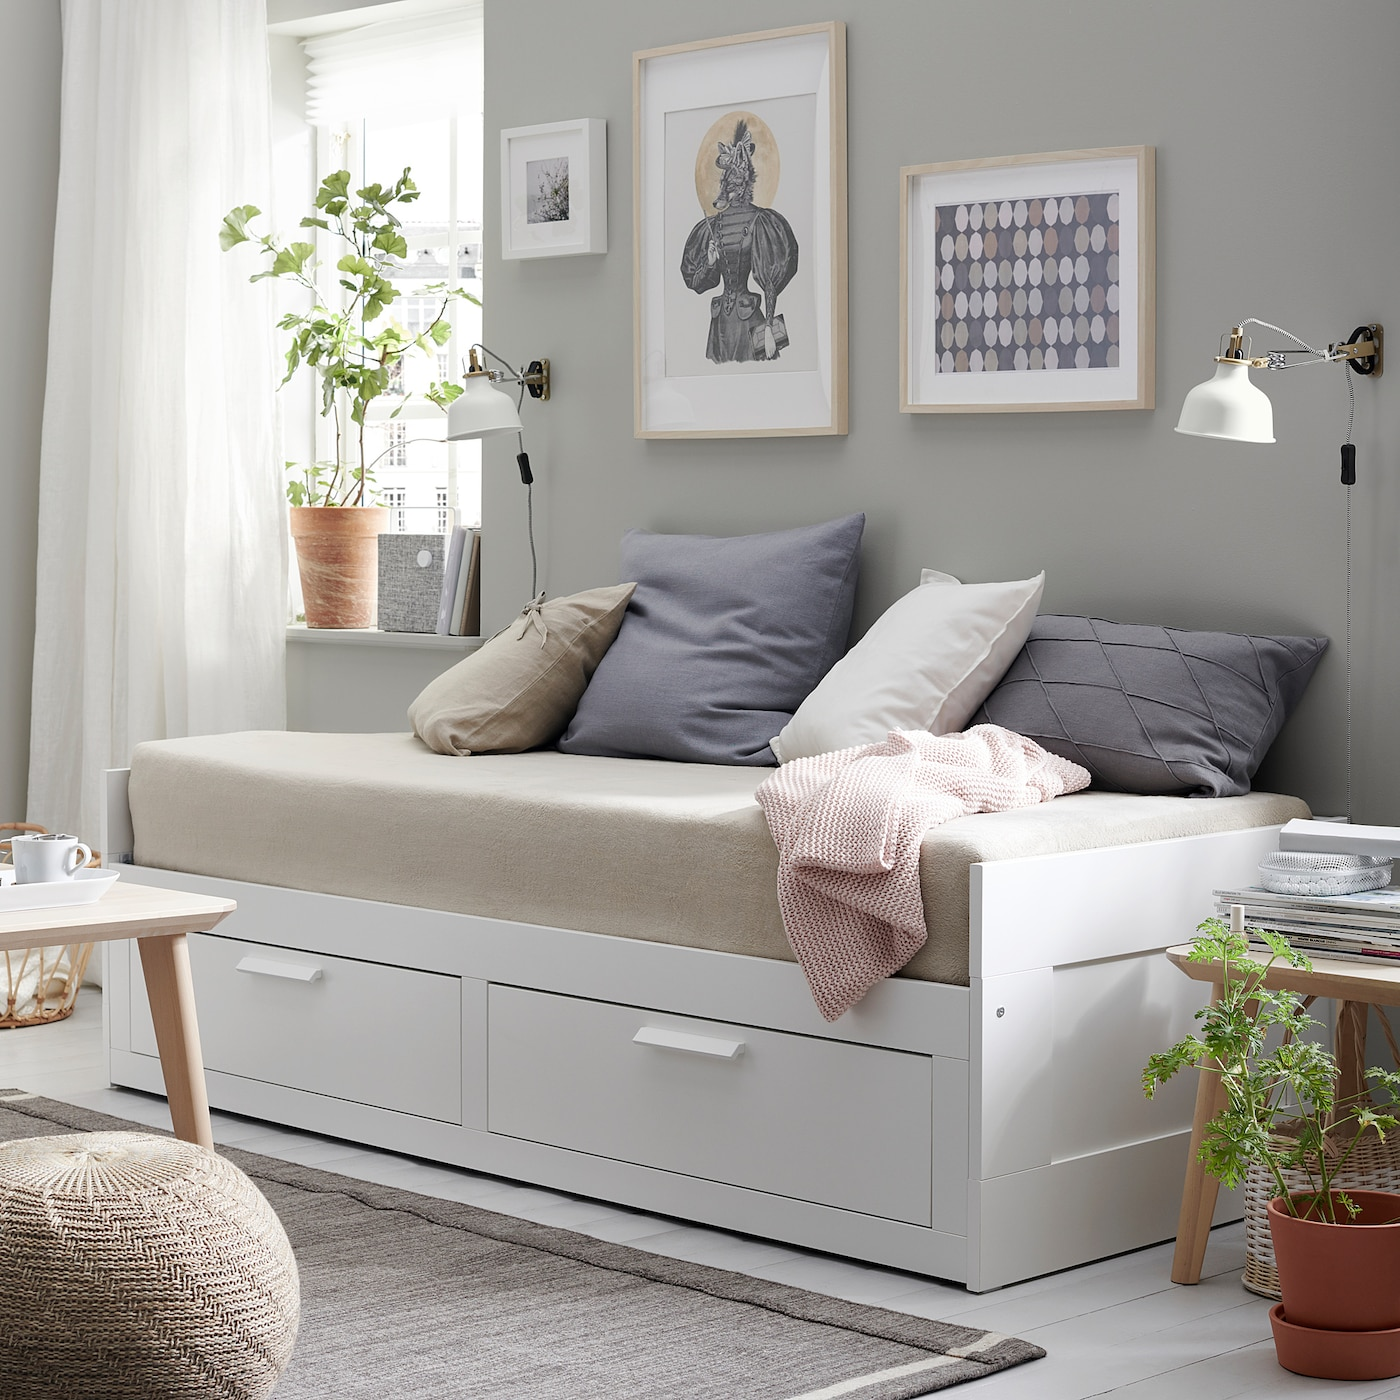 Ikea Brimnes Day Bed W 2 Drawers Mattresses